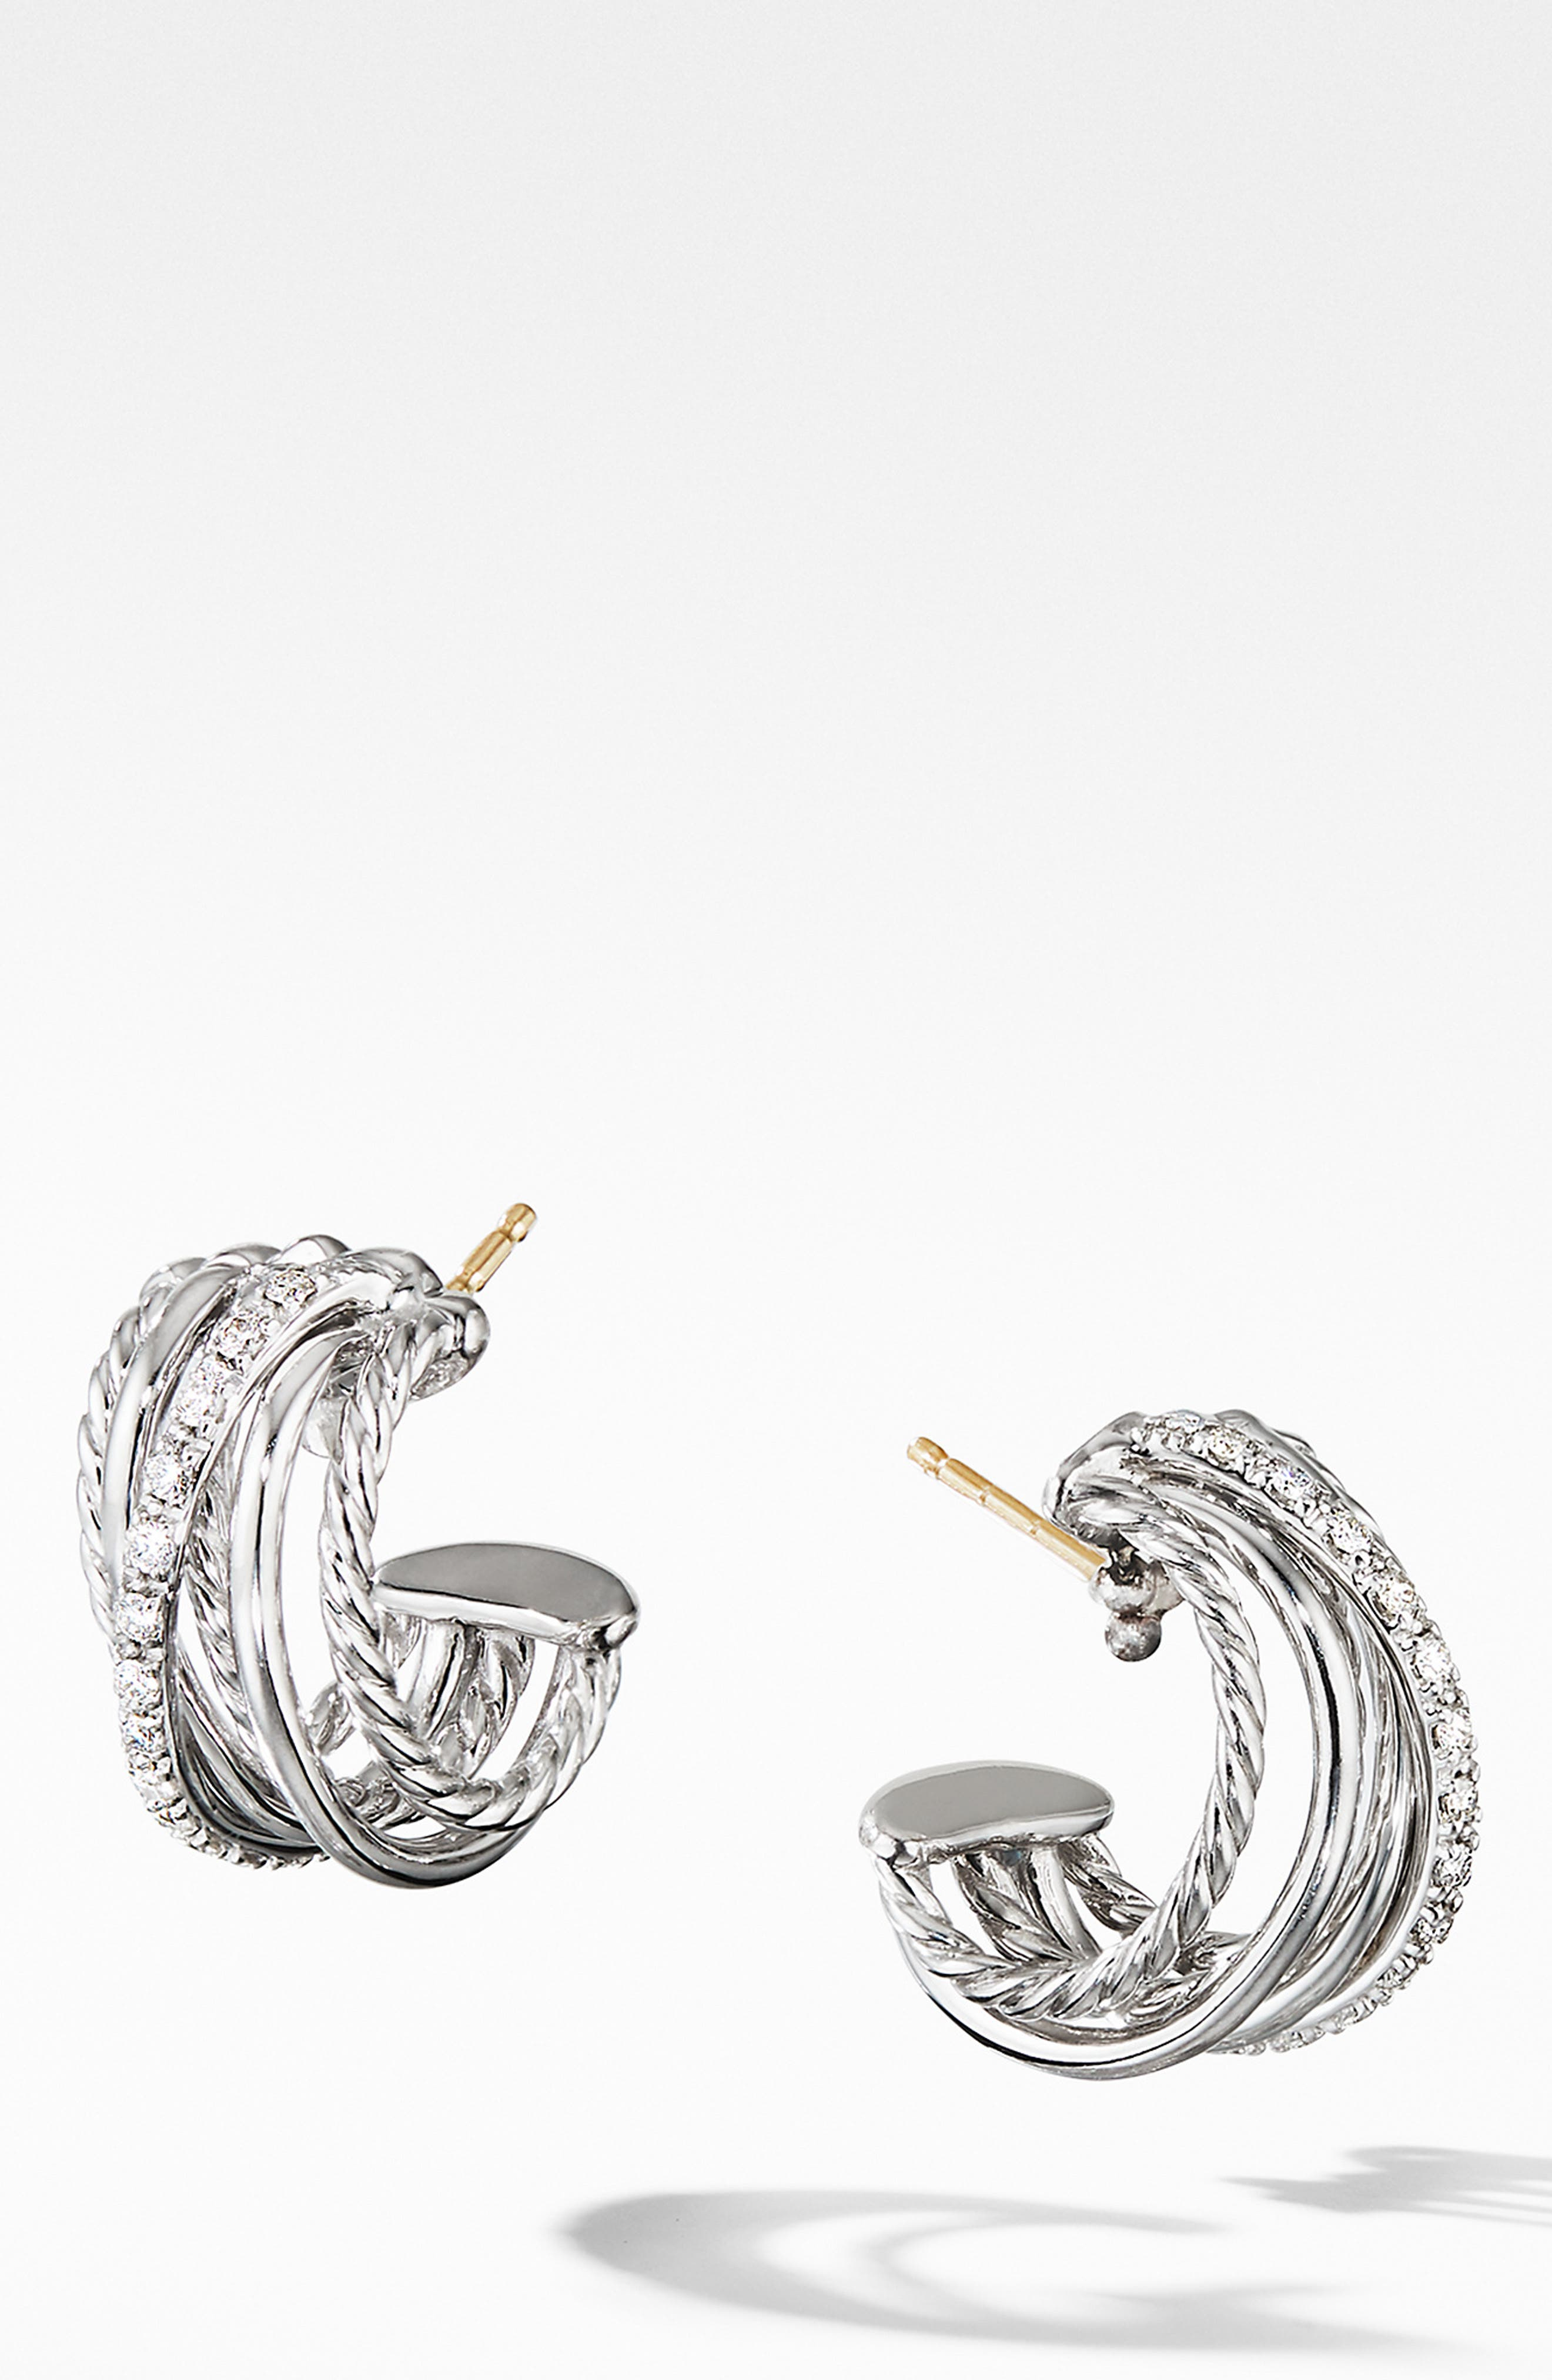 DAVID YURMAN, Crossover Huggie Hoop Earrings with Diamonds, Main thumbnail 1, color, SILVER/ DIAMOND